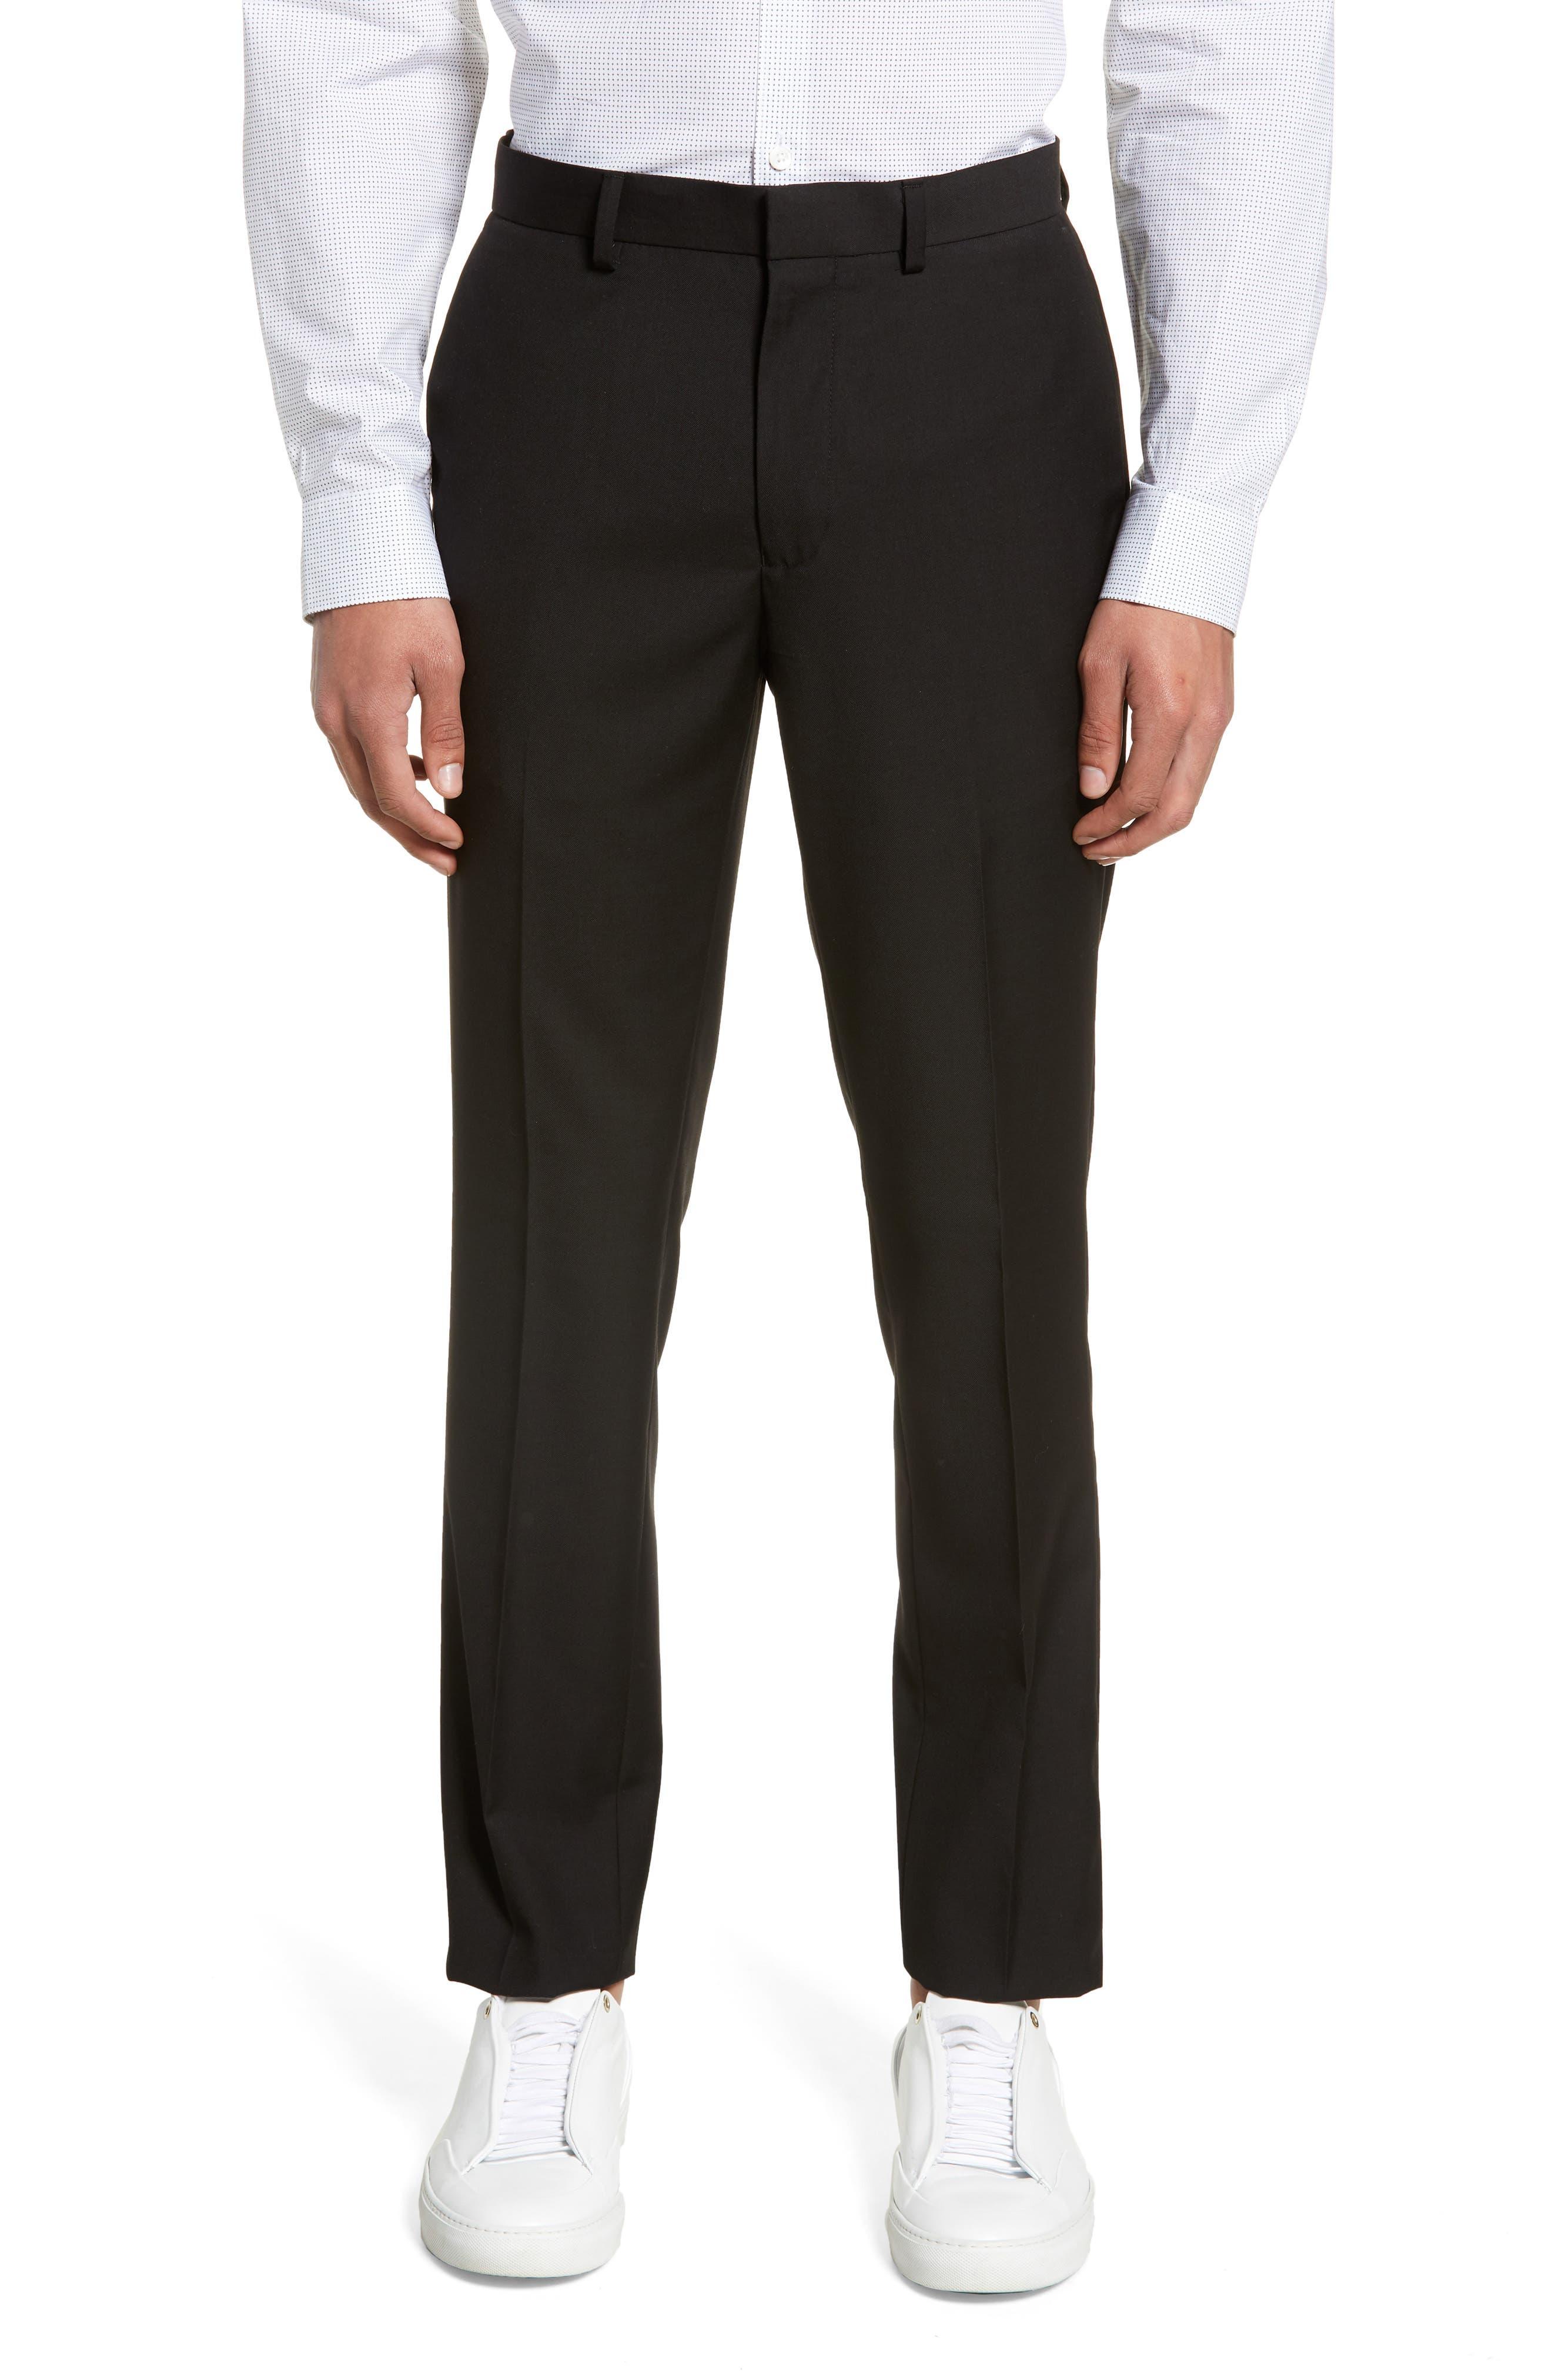 TOPMAN, Black Skinny Fit Trousers, Main thumbnail 1, color, BLACK